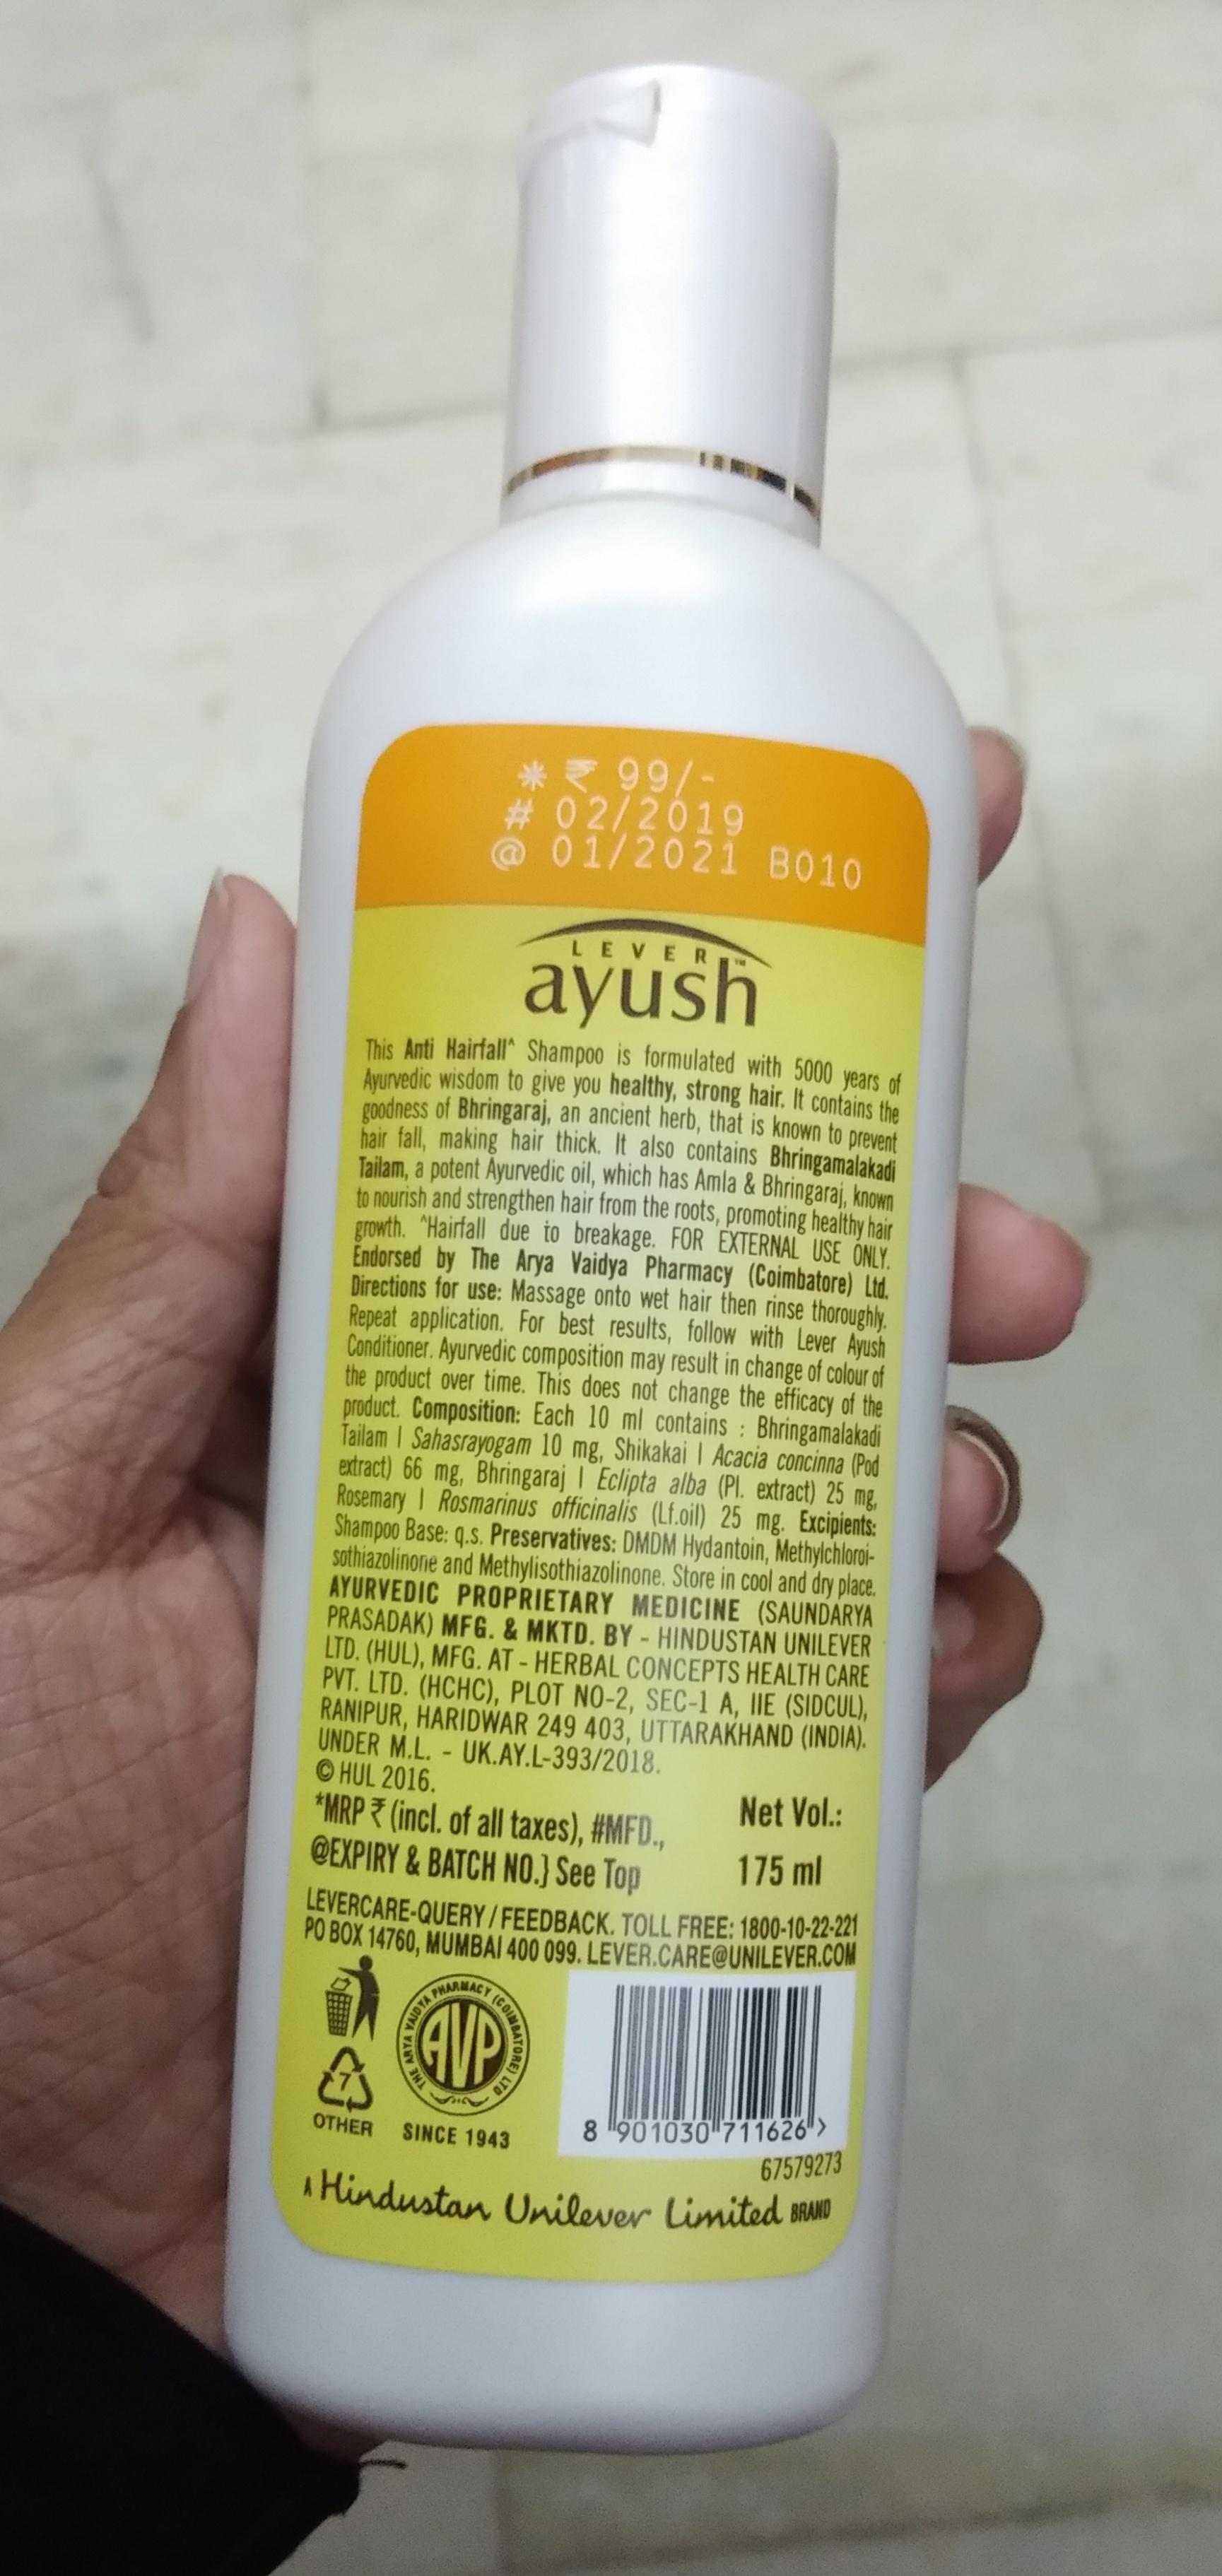 Lever Ayush Anti Hairfall Bhringaraj Shampoo-Not satisfied-By Nasreen-1